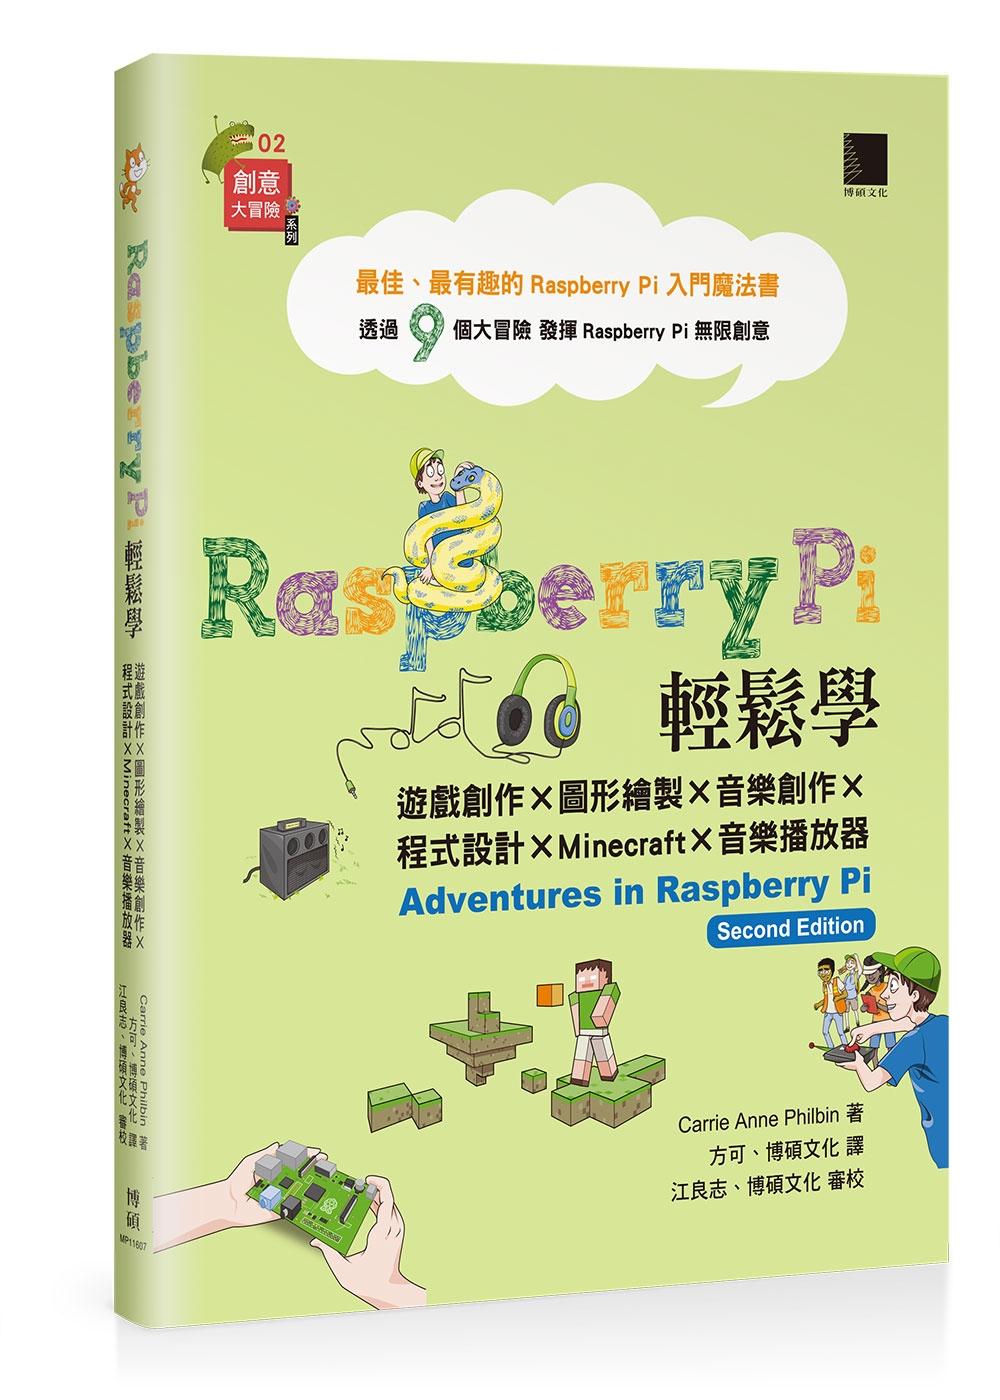 Raspberry Pi輕鬆學:遊戲創作×圖形繪製×音樂創作×程式設計×Minecraft×音樂播放器